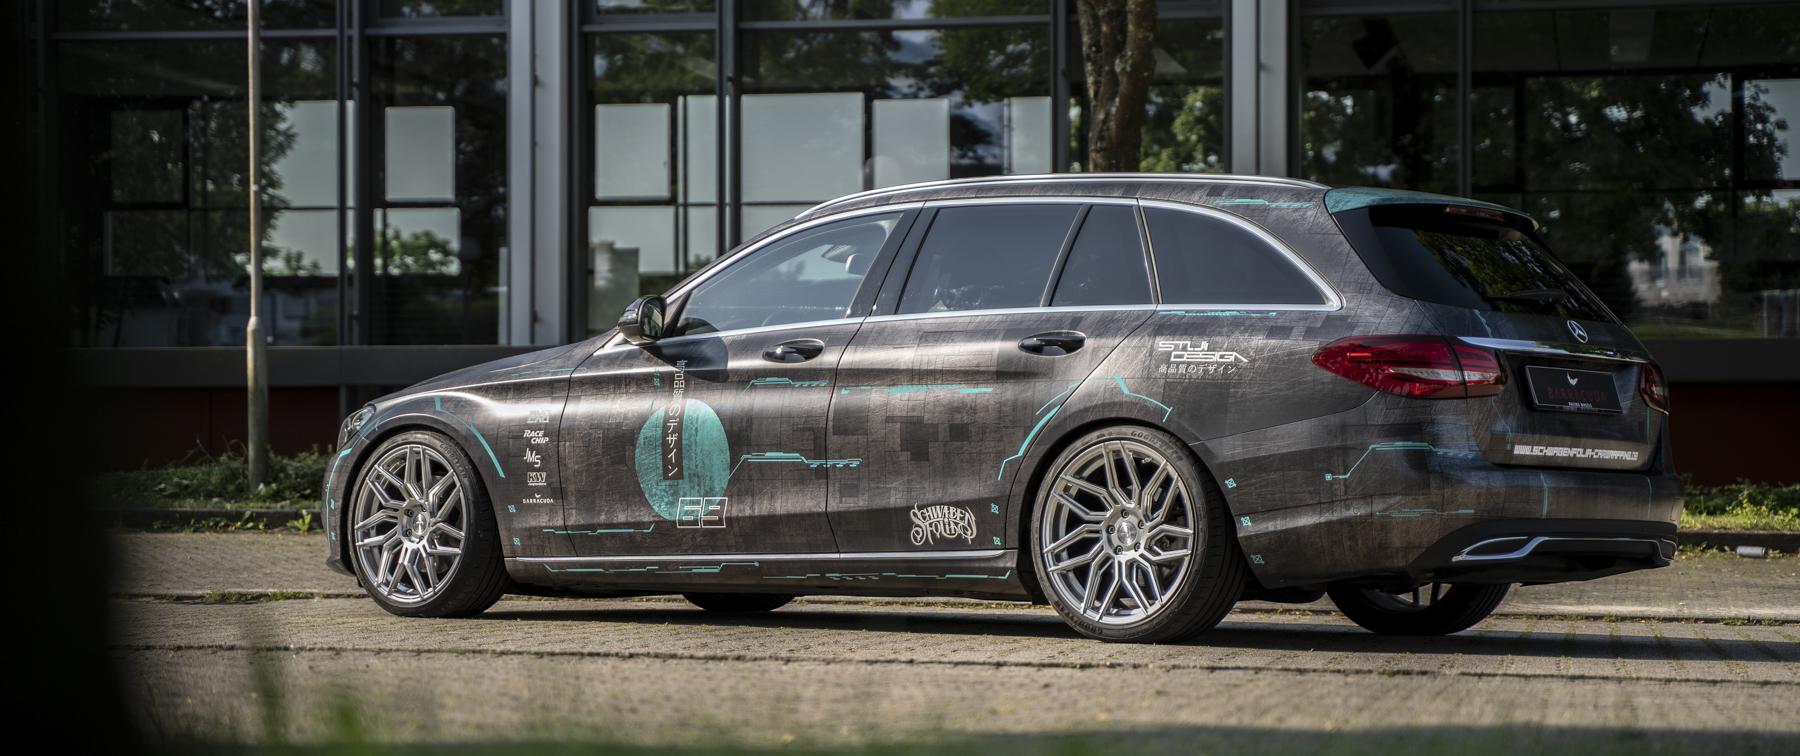 Mercedes-Benz – C-Klasse – Grau – BARRACUDA – Dragoon – Silber – 19 Zoll